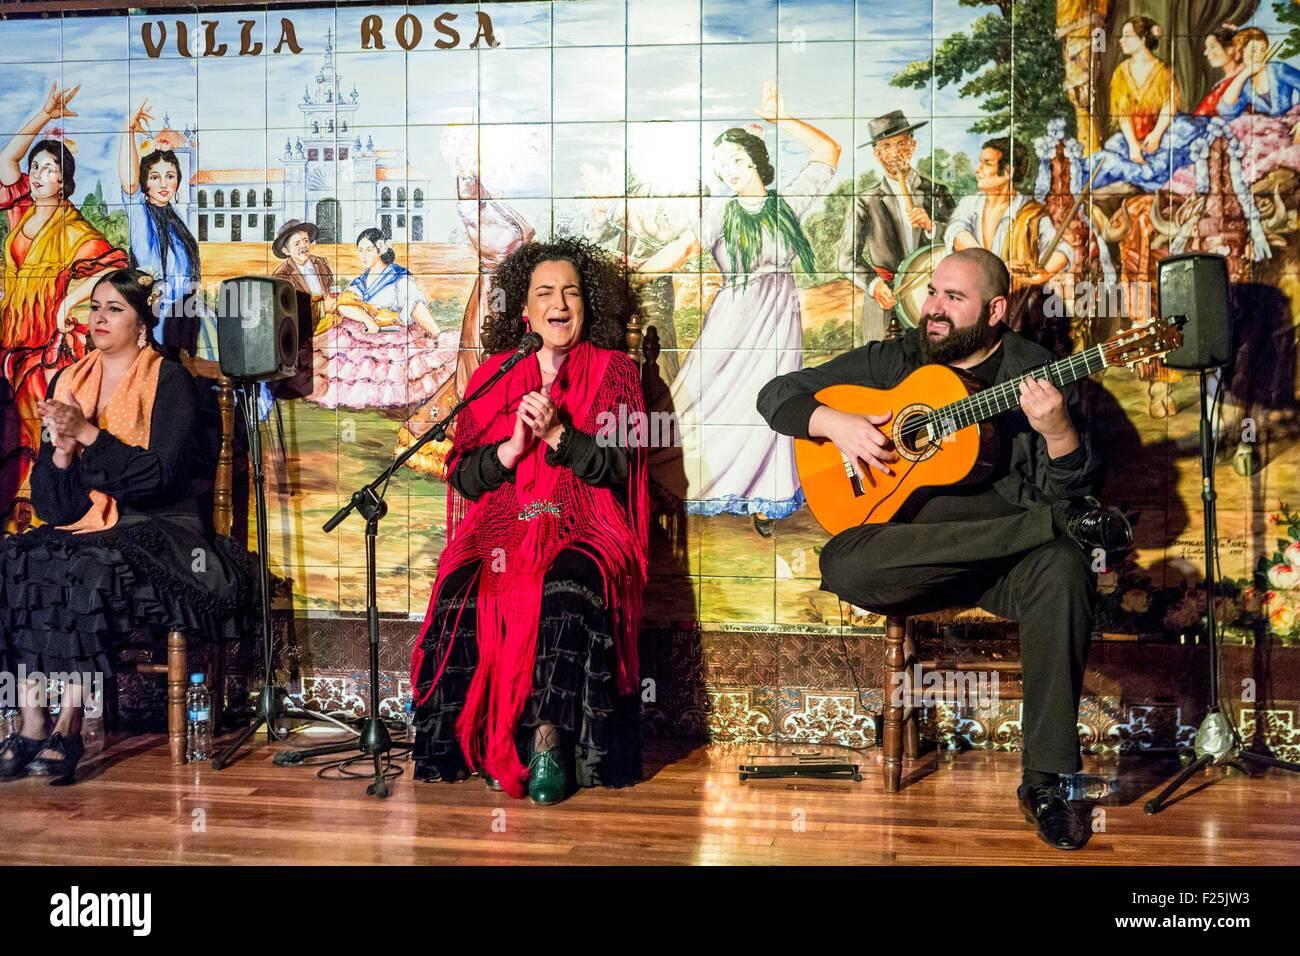 Spain, Madrid, district las Huertas, Flamenco show at the Villa Rosa - Stock Image